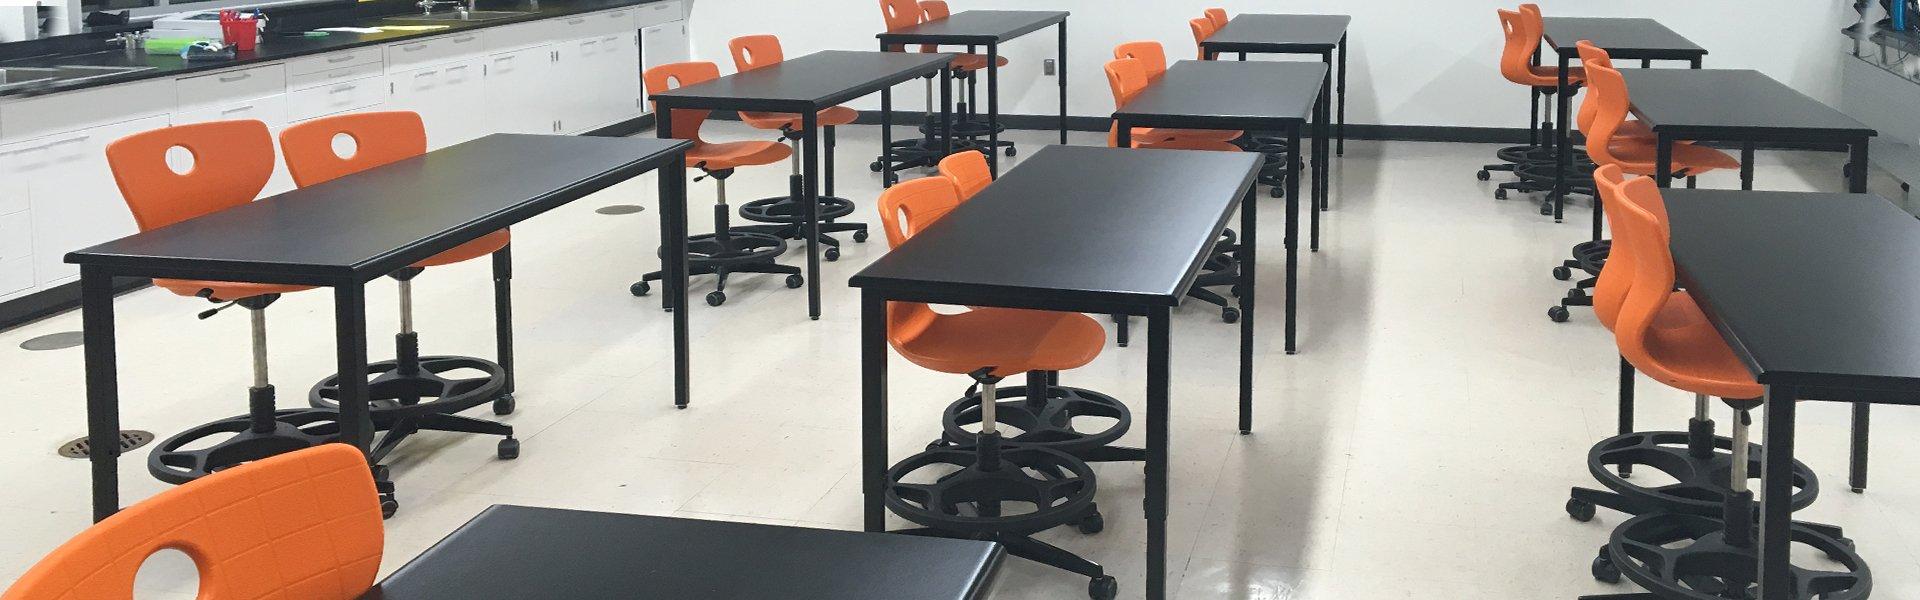 Corilam Adjustable Desk Height Classroom Lab